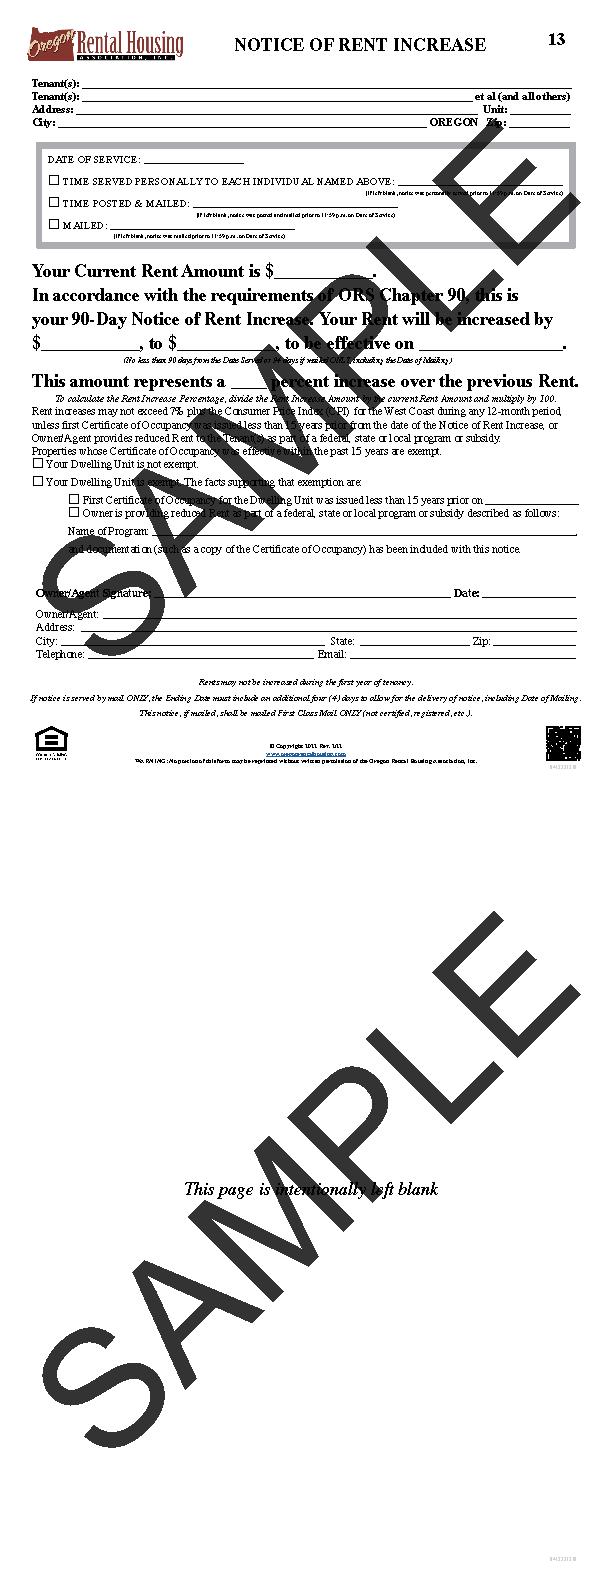 Oregon Rental Housing Association - Choose Your Form